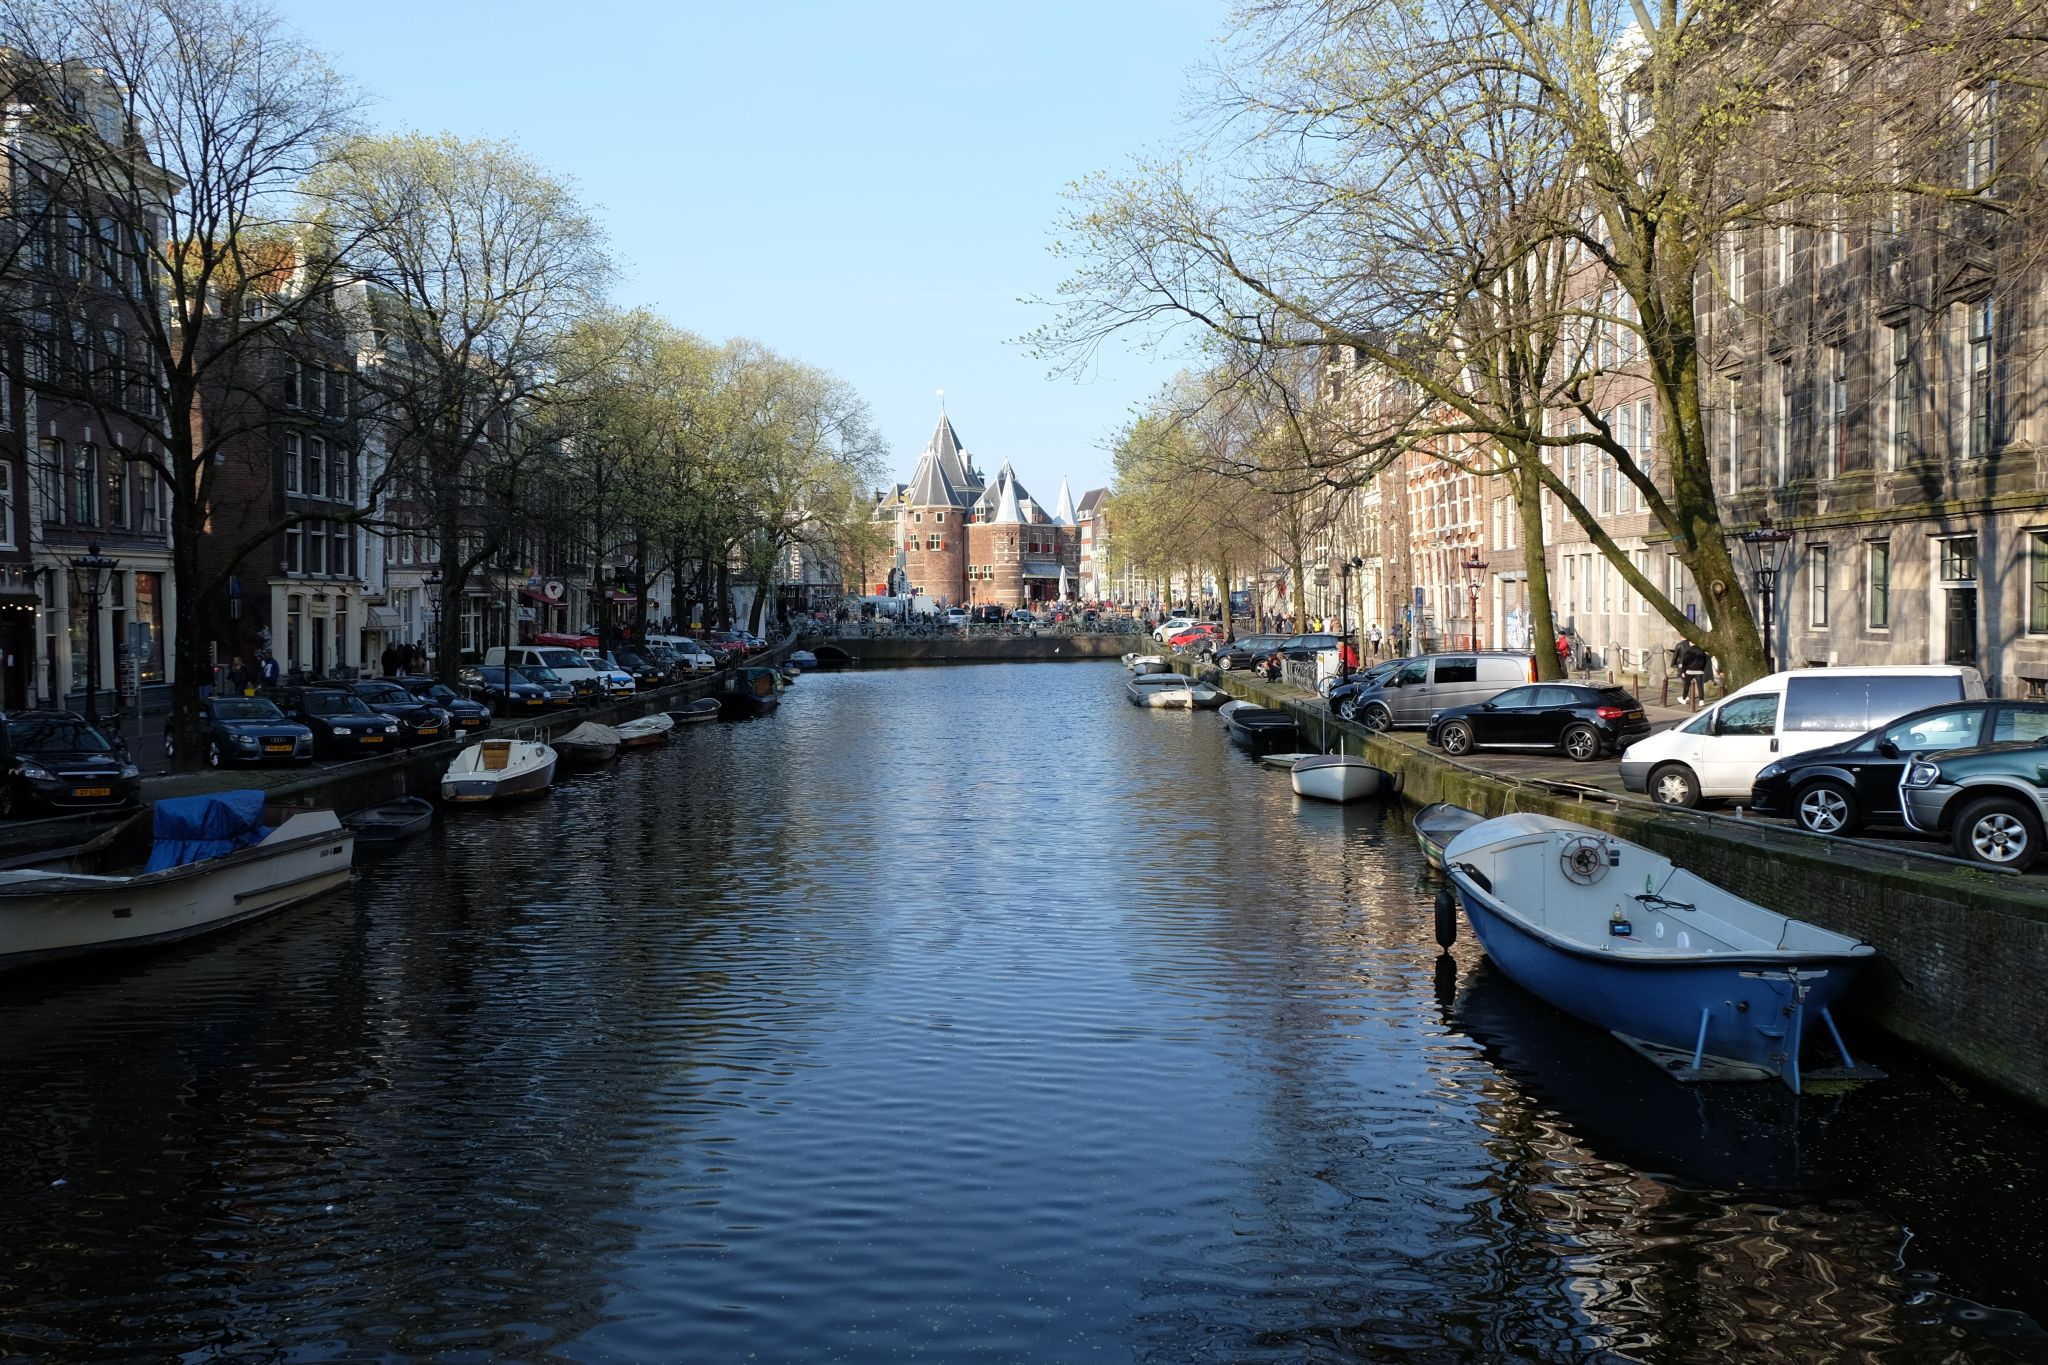 Kloveniersburgwal, Amsterdam, Netherlands